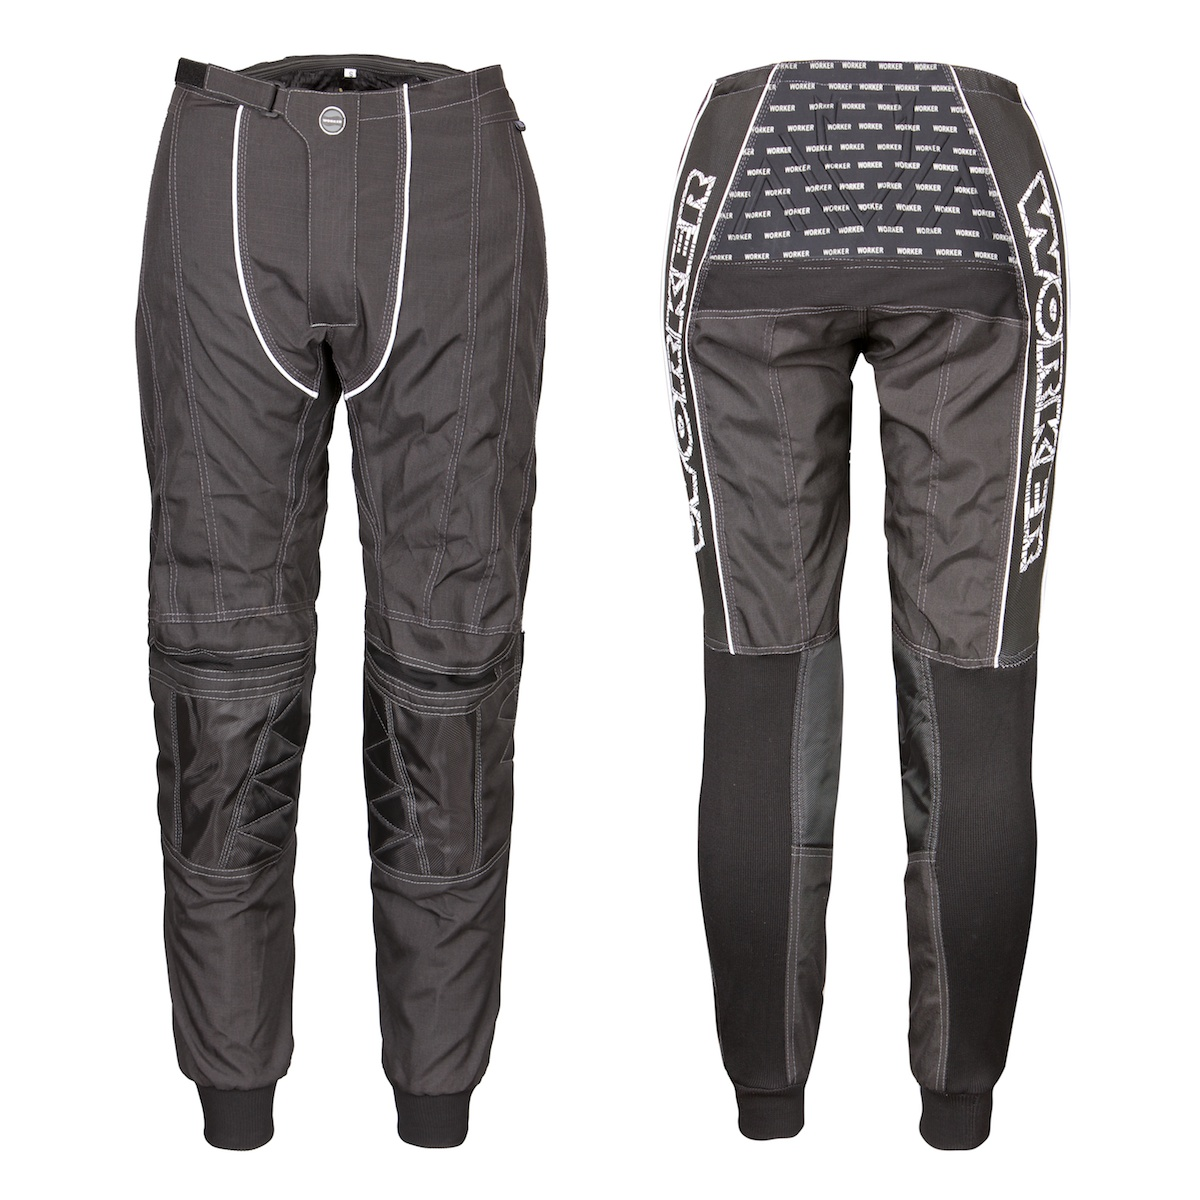 Motokrosové kalhoty WORKER Razzor Junior černá - Junior M (7 - 8 let)